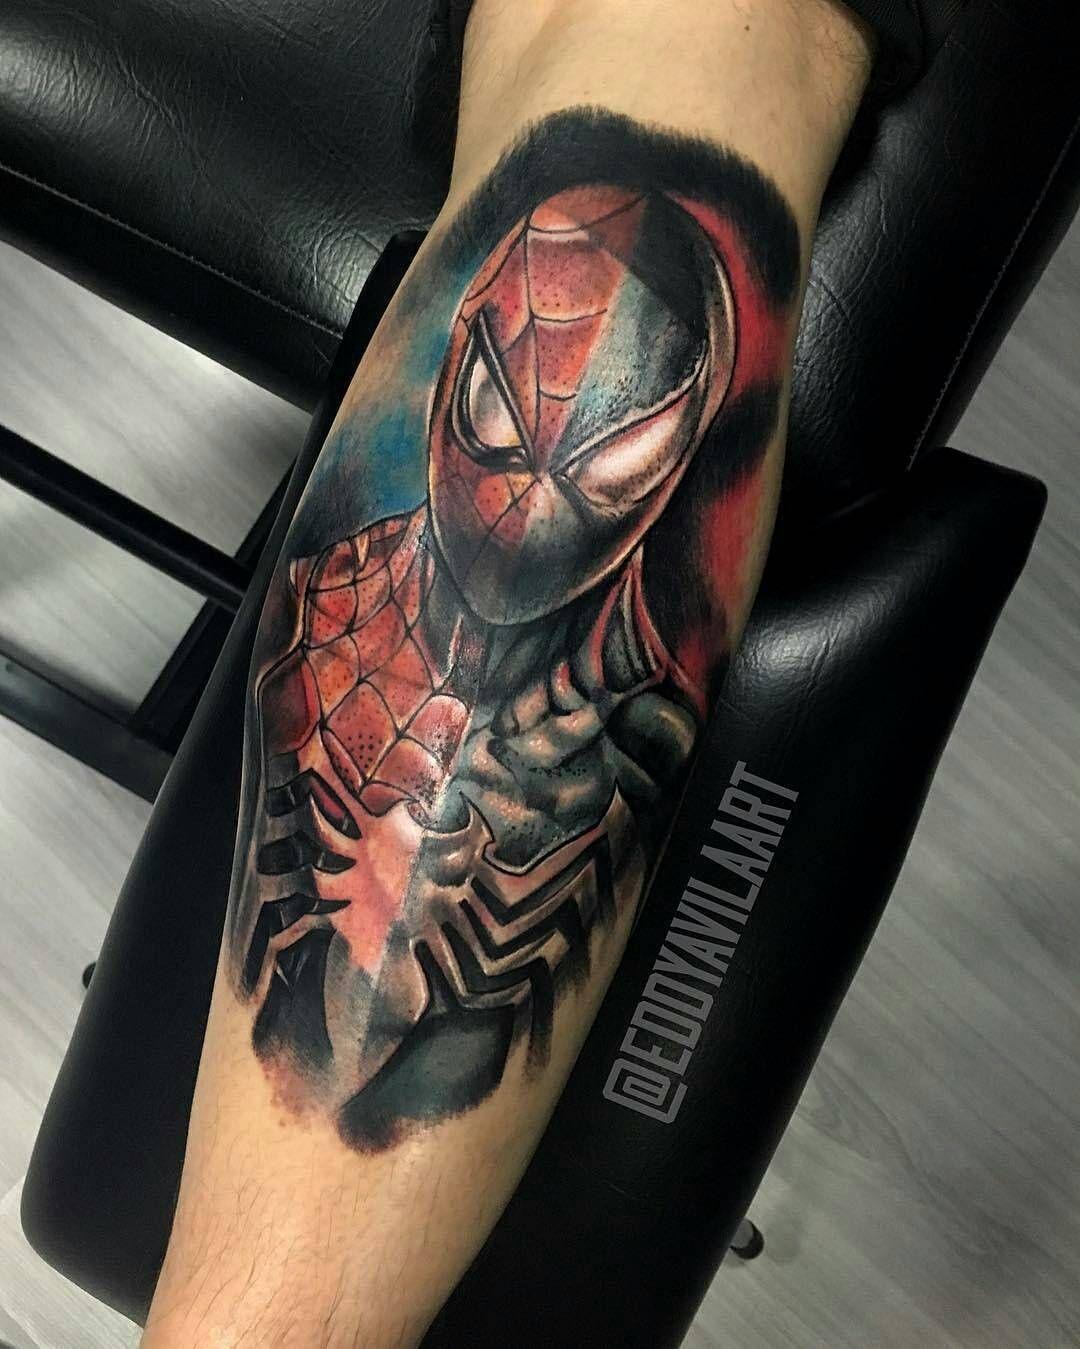 Tatuajes Bogota Unicentro from @eddyavilaart - spider-man & the symbiote suit spelit! #tattoo